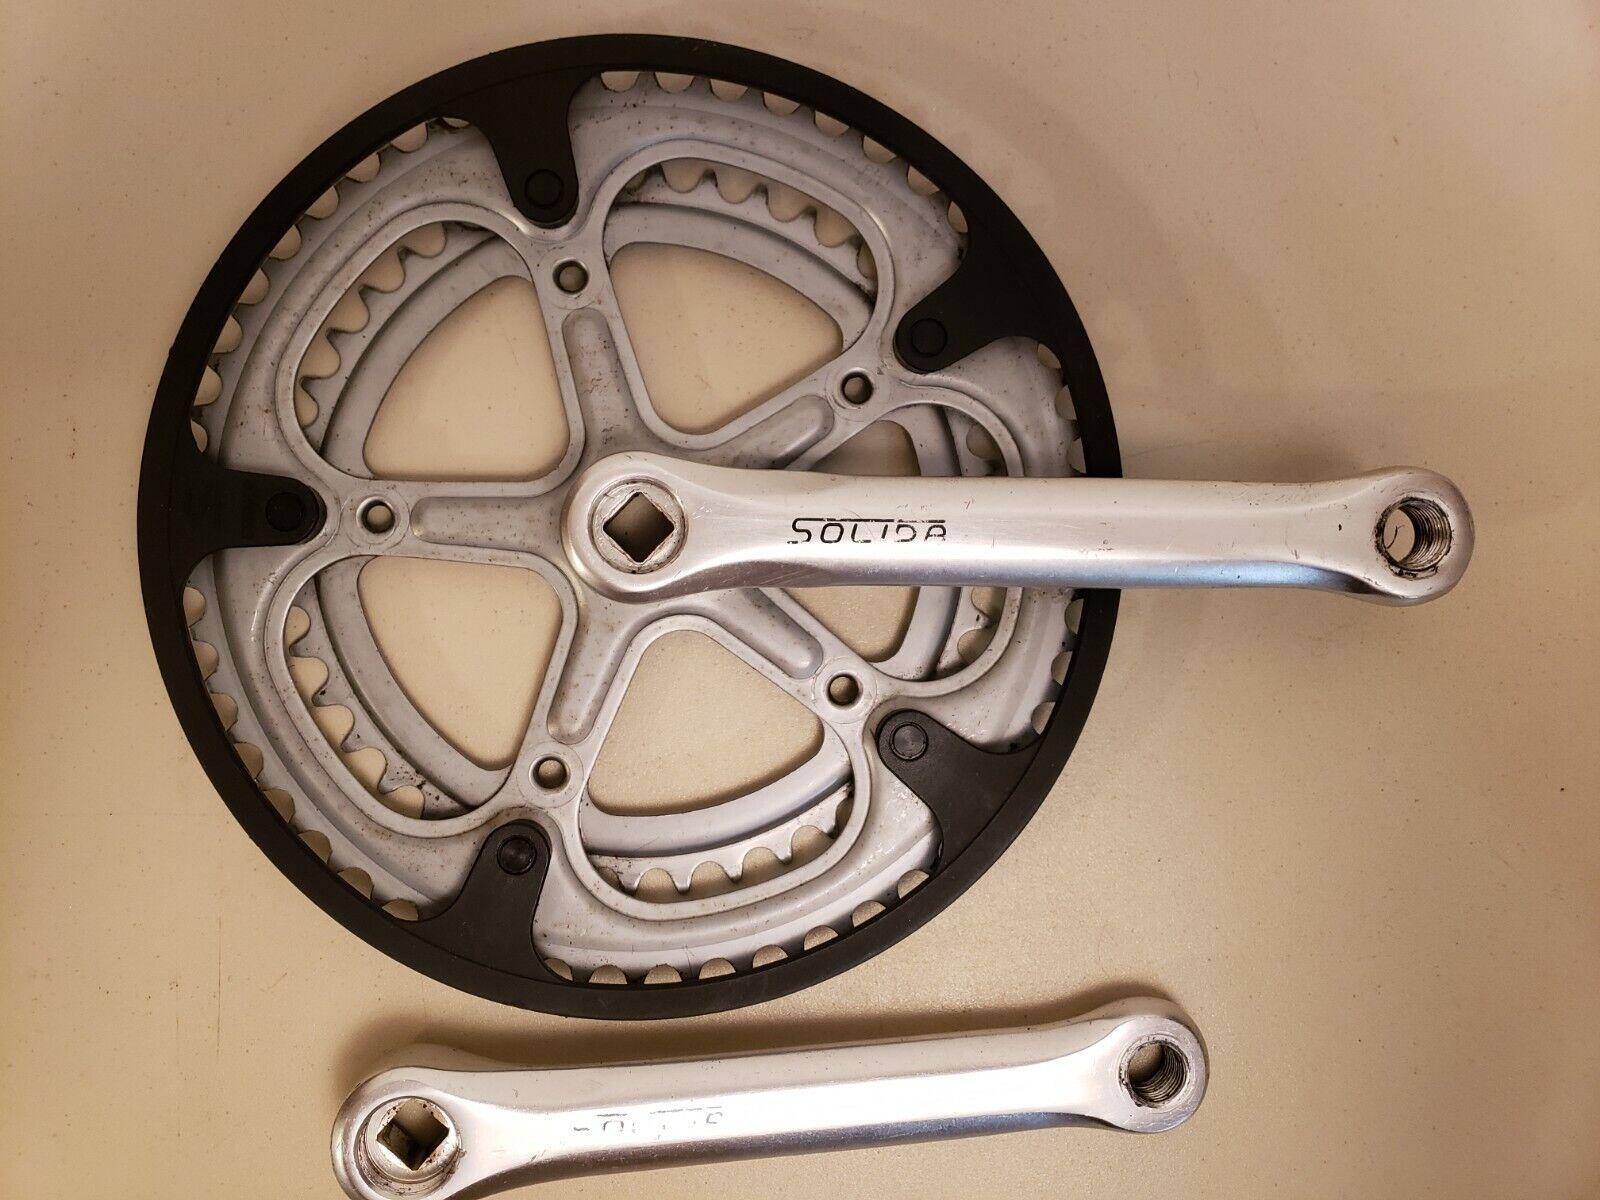 Vintage  Solida Bicycle Crankset....Double...170mm...52-42t...Road Bike..France  special offer